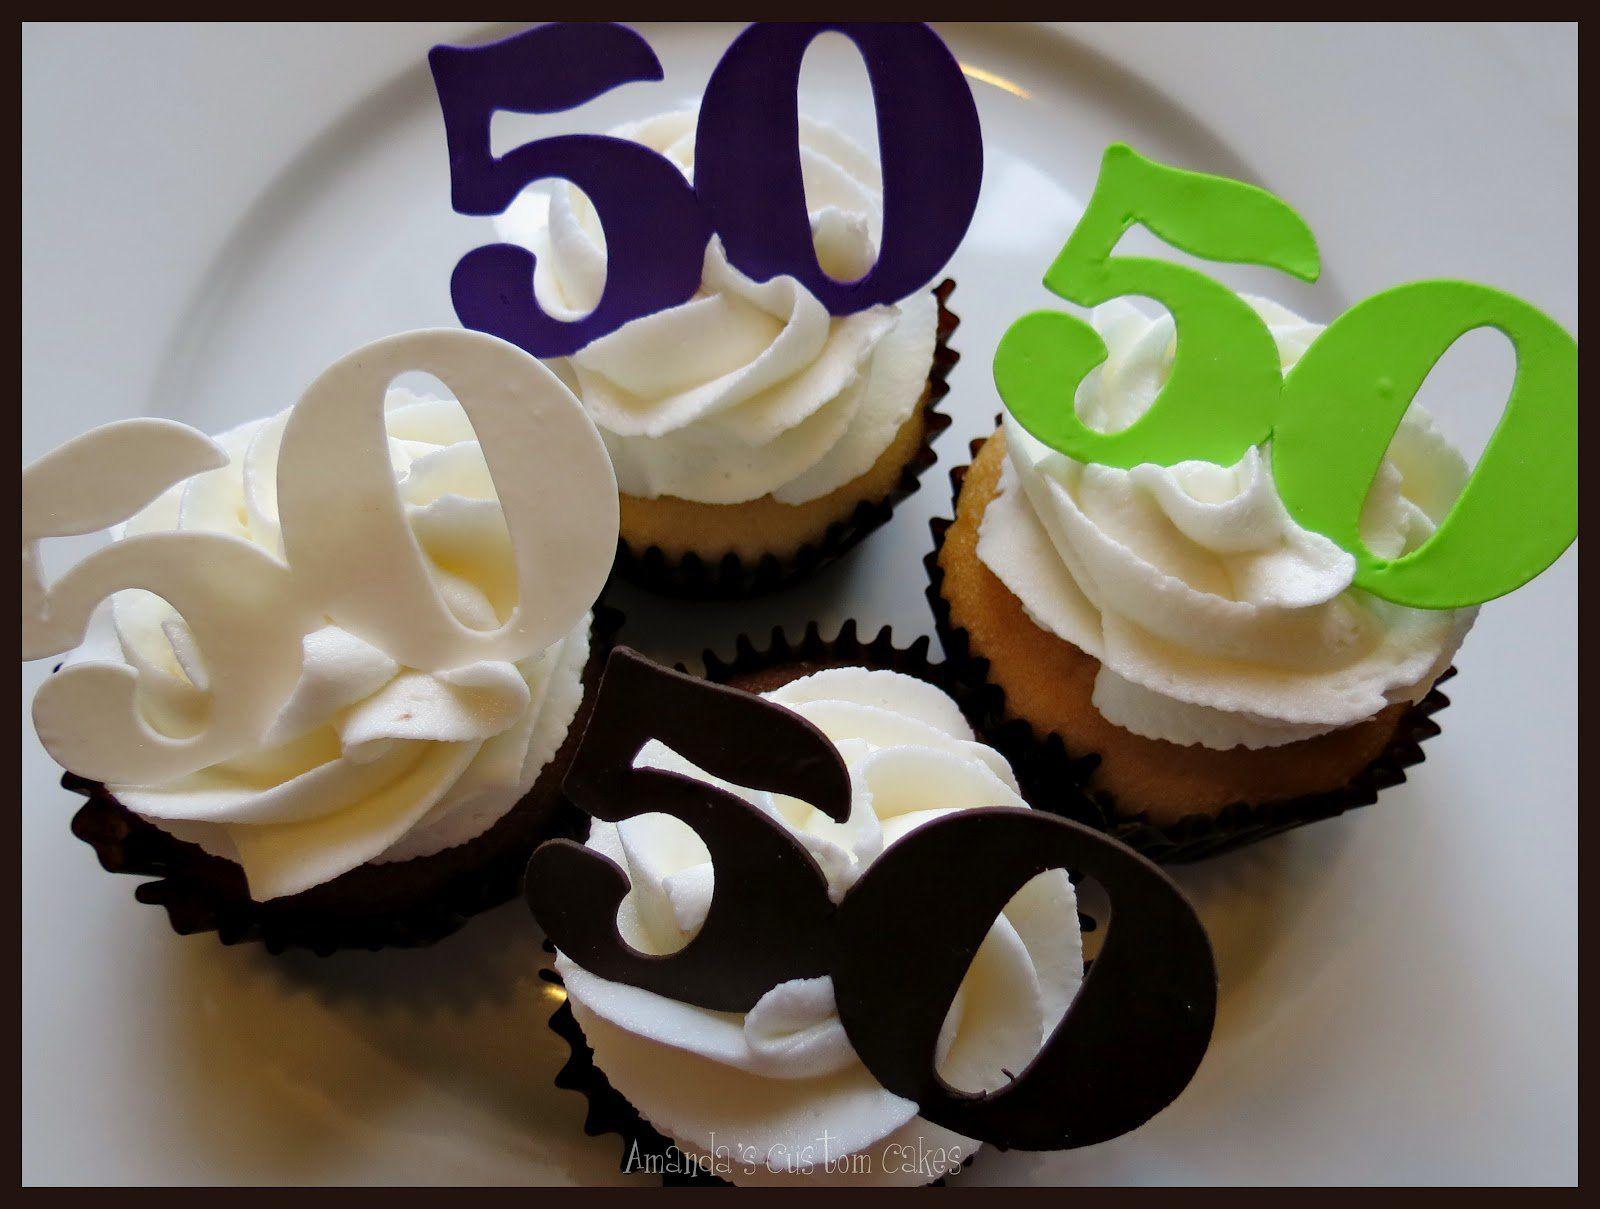 50th Birthday Party Ideas